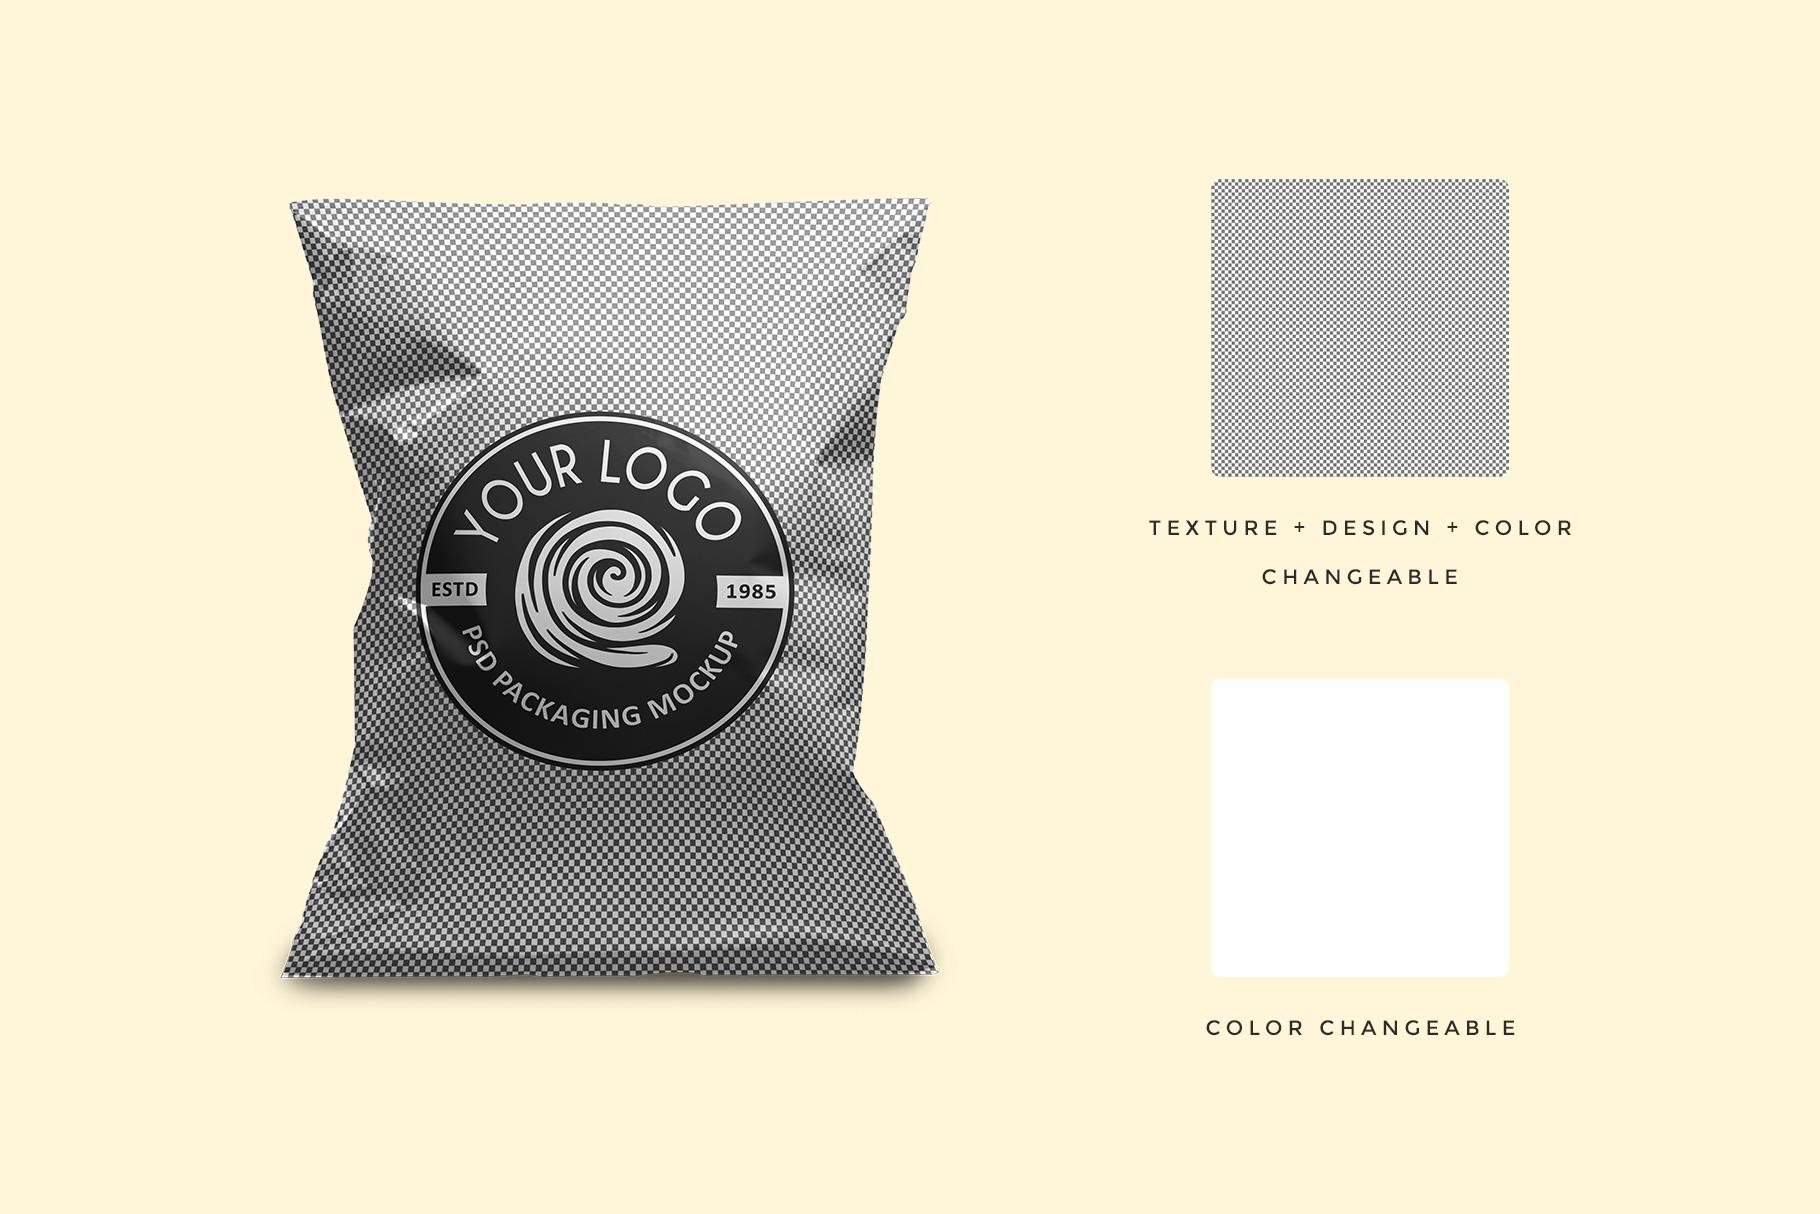 editability of the aluminum foil snack bag packaging mockup